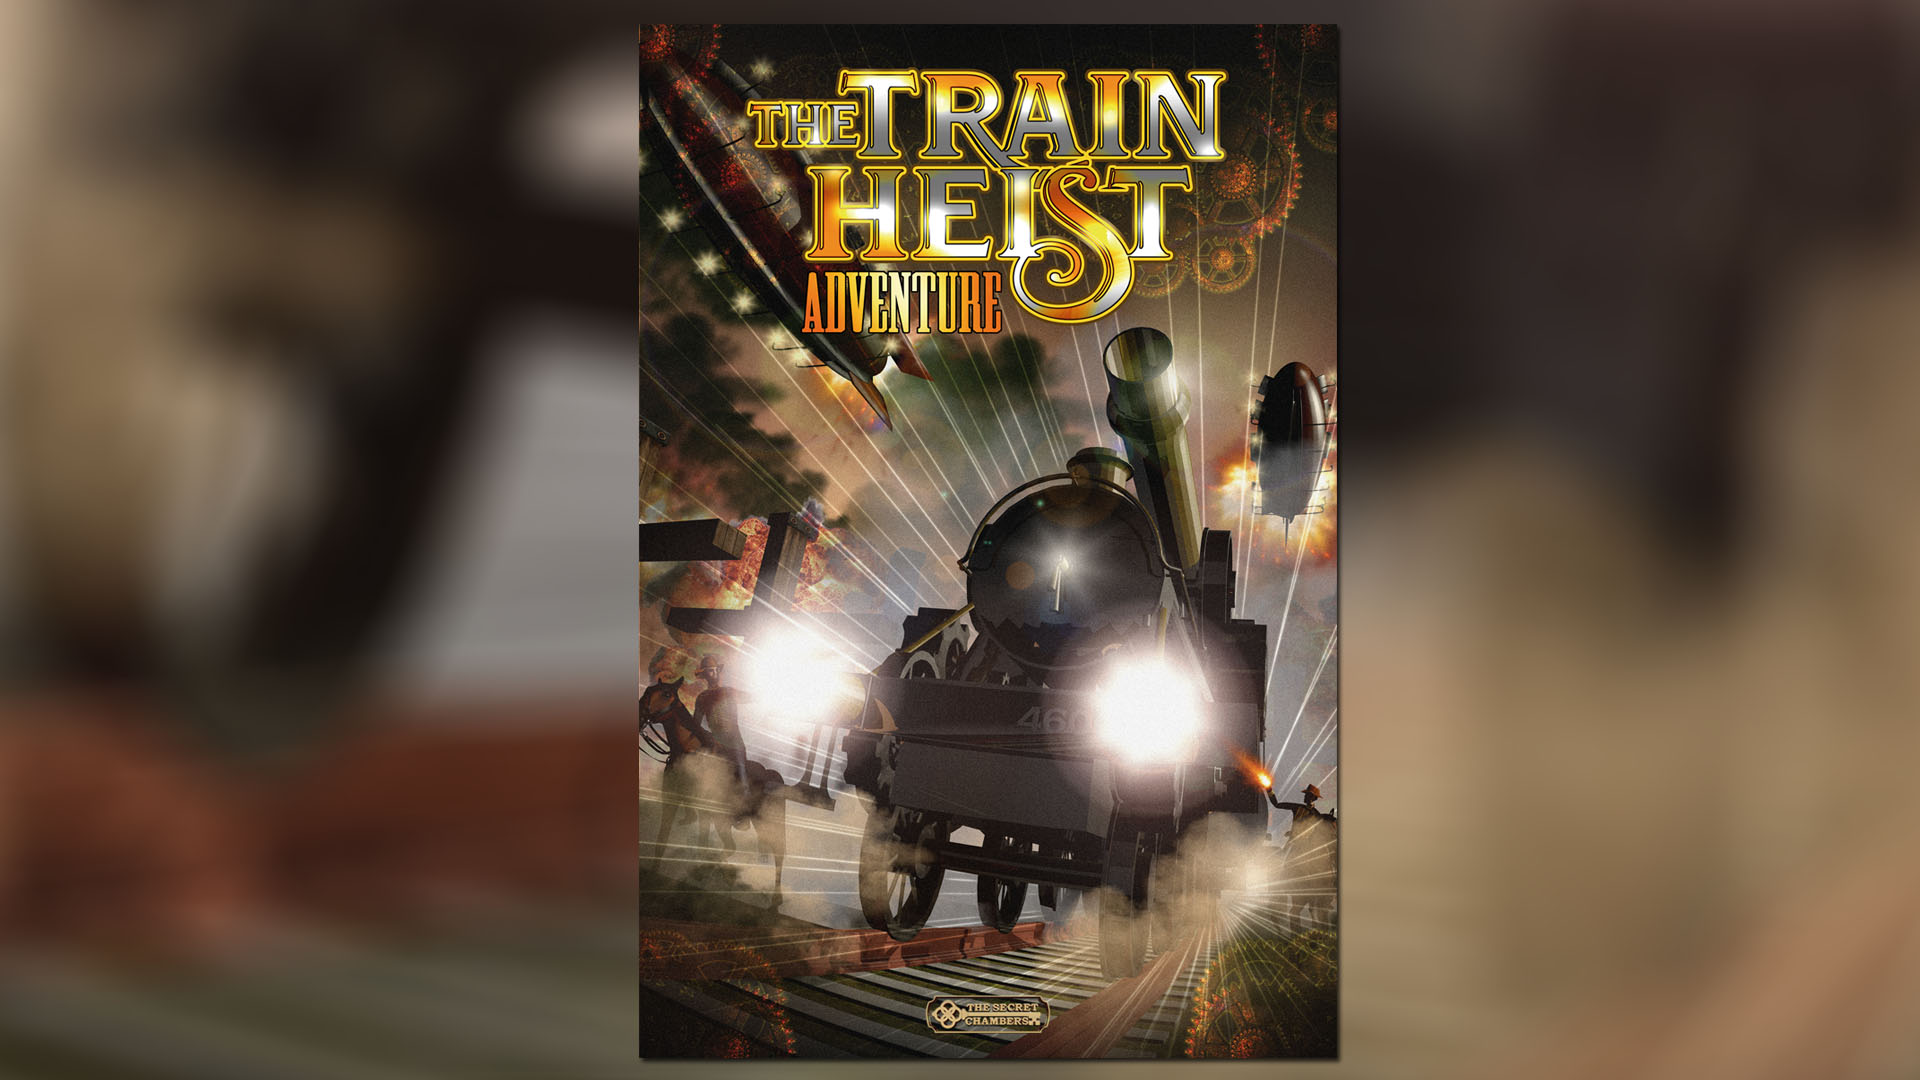 Train Heist Adventure